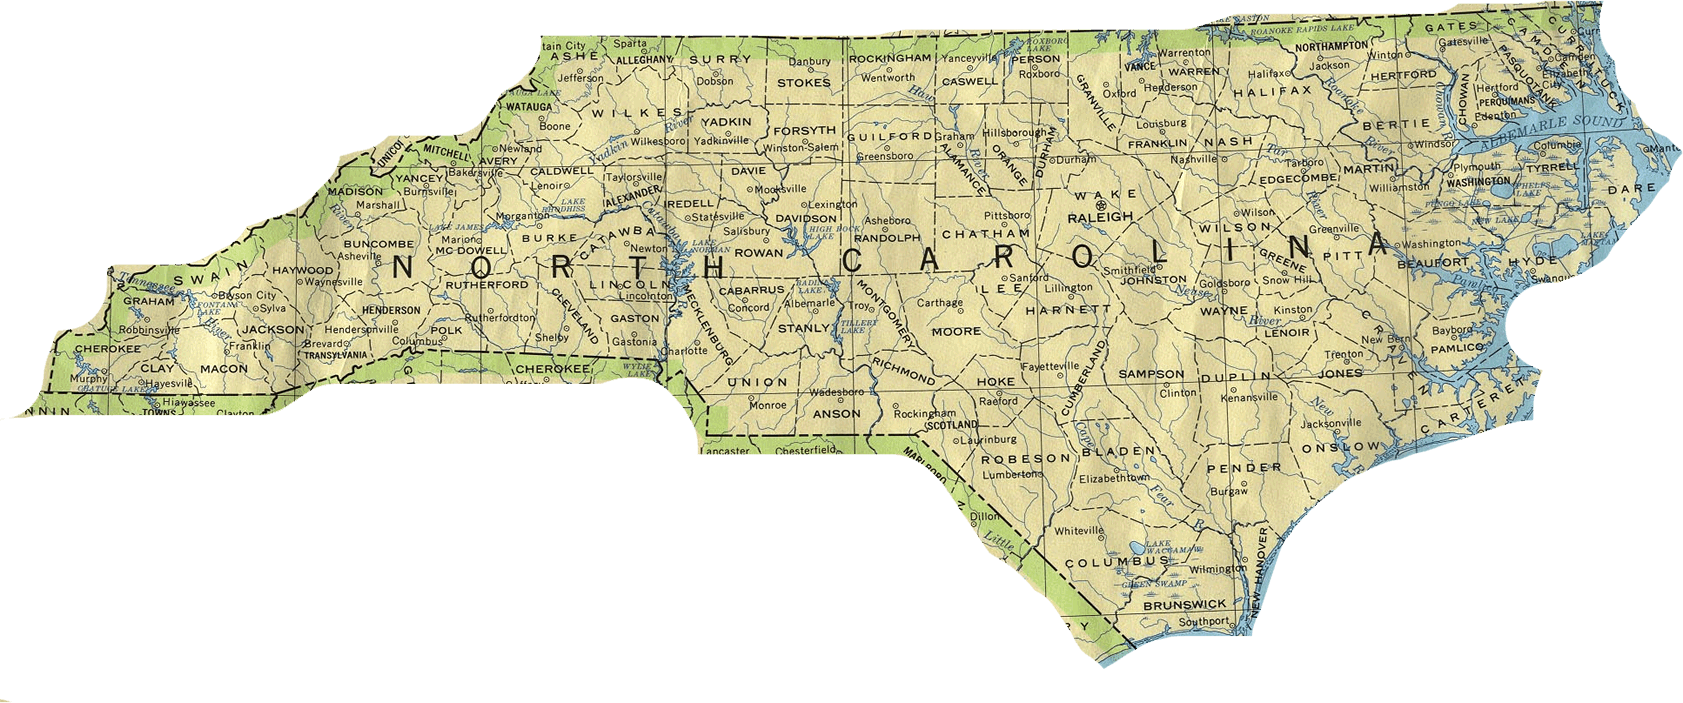 north carolina state map. north carolina state map  north carolina  pinterest  north carolina